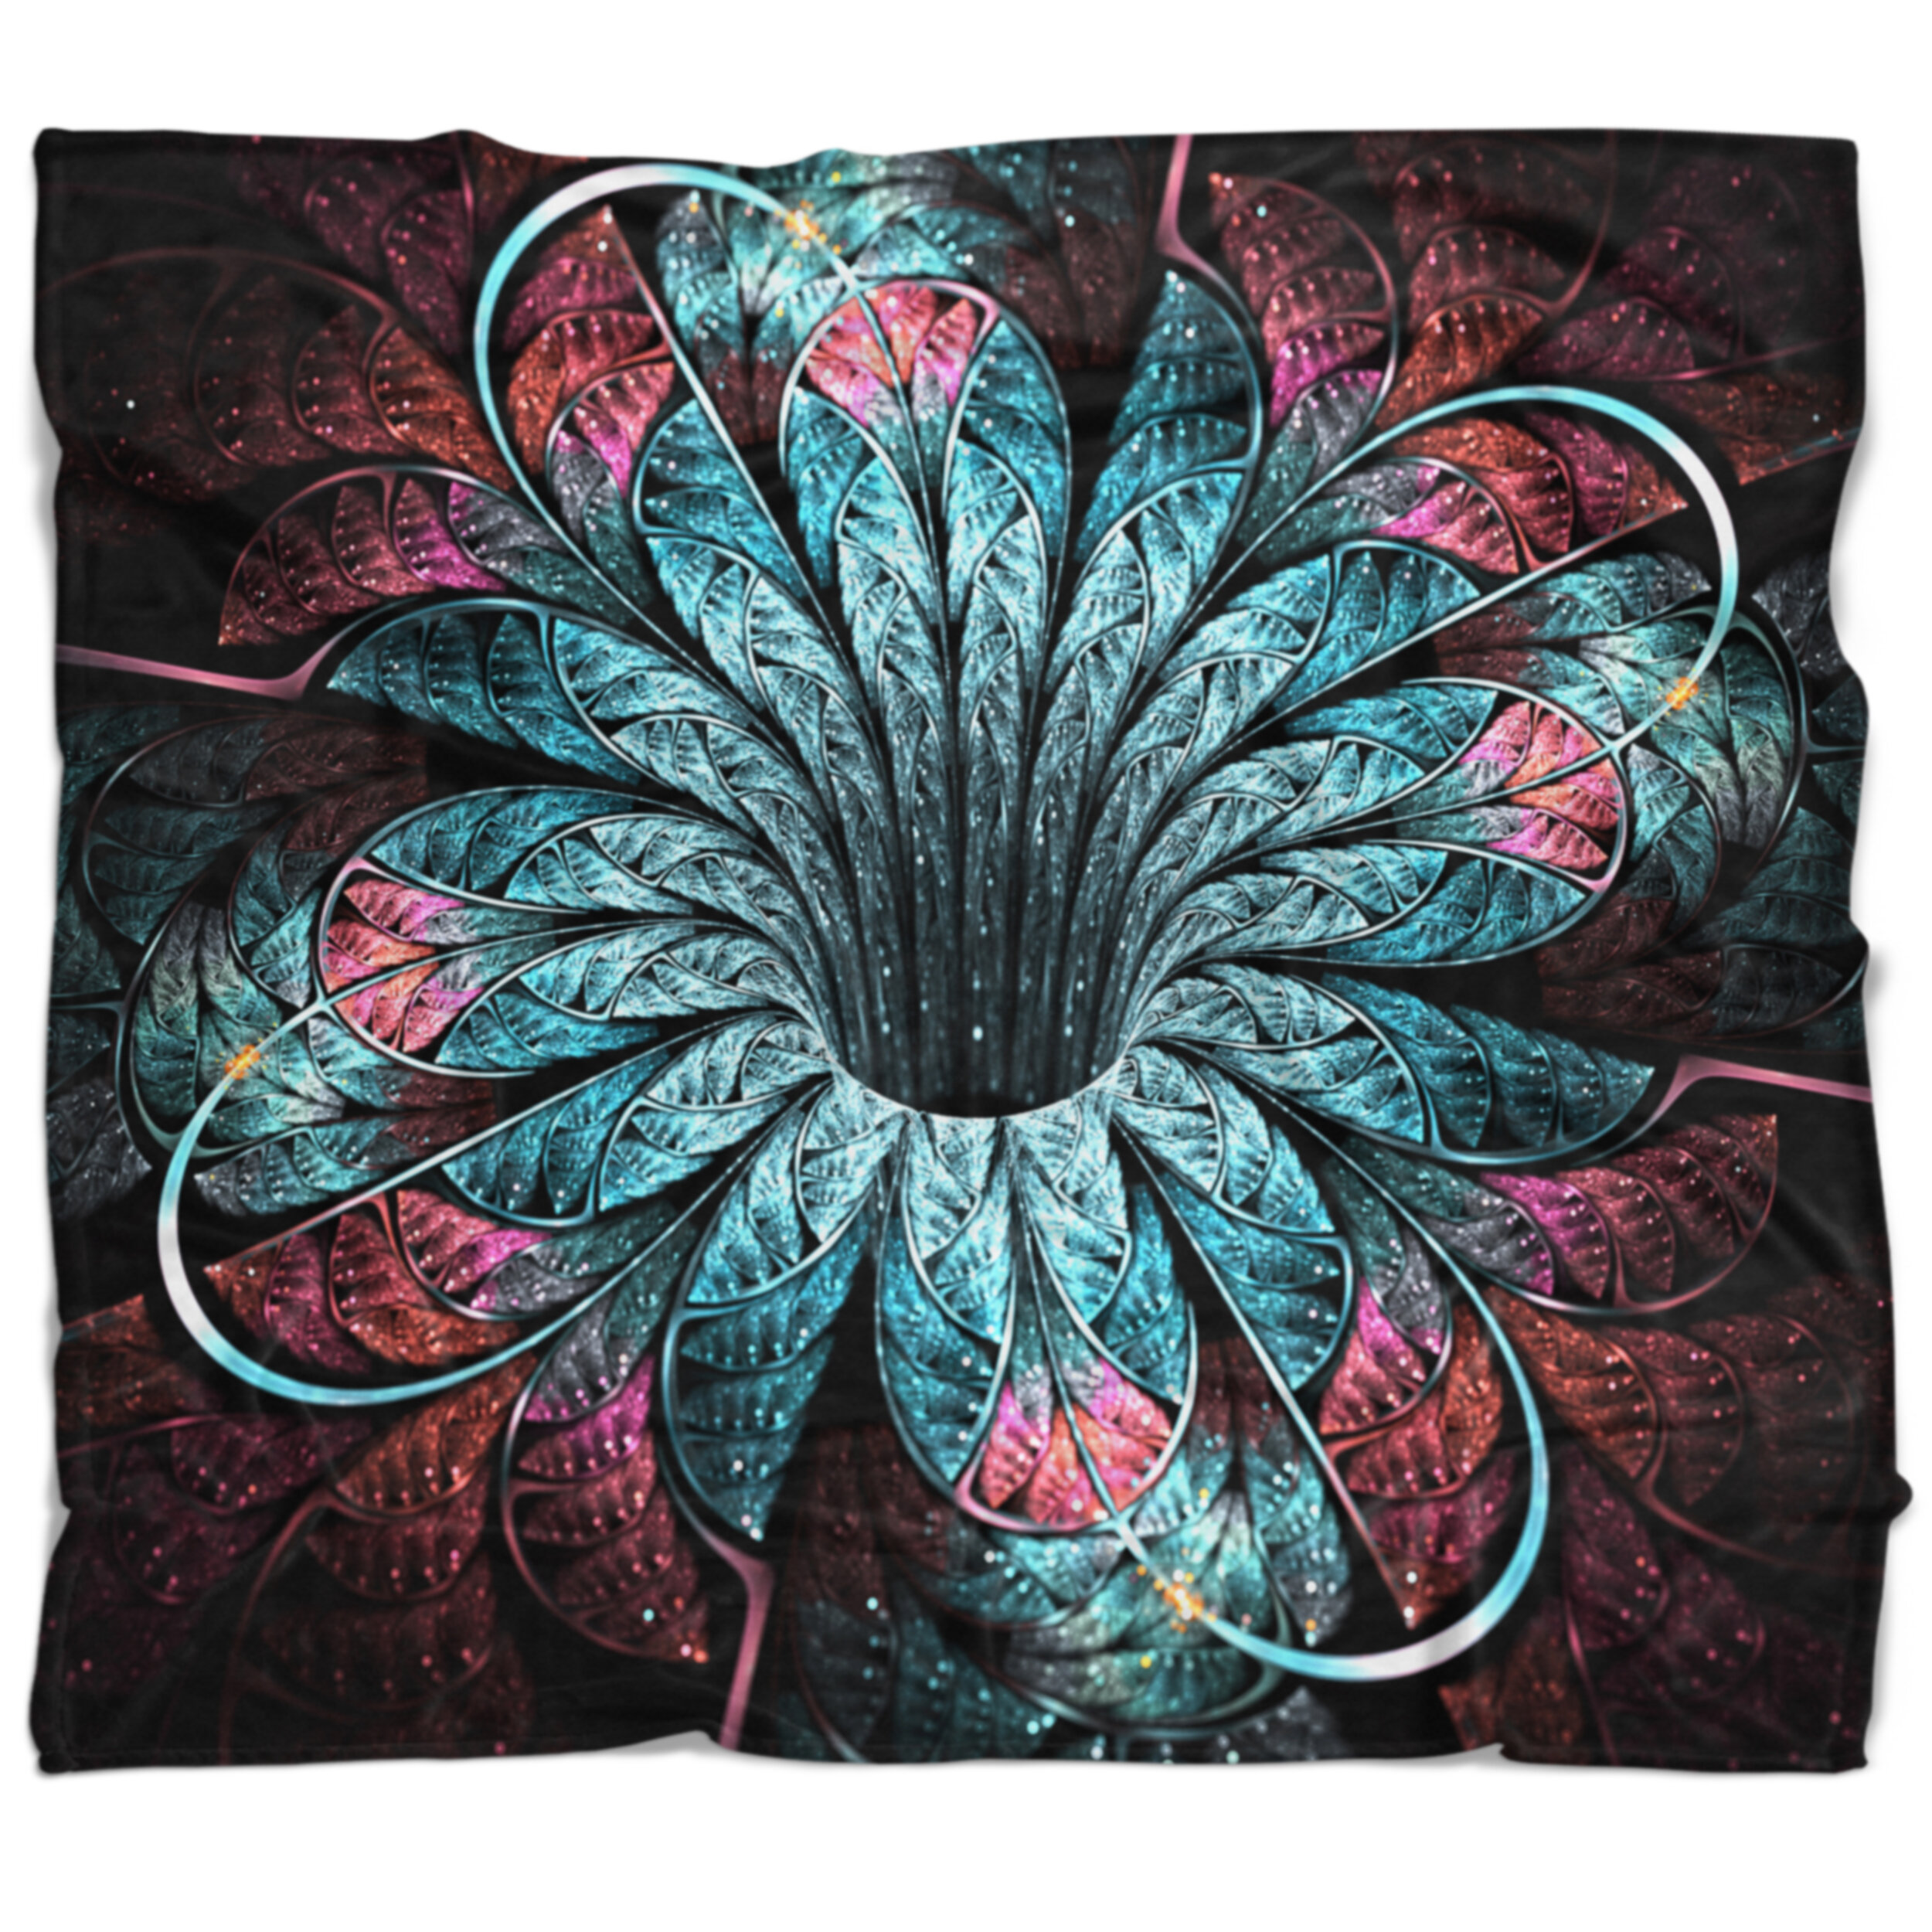 East Urban Home Floral Glittering Fractal Digital Art Blanket Wayfair